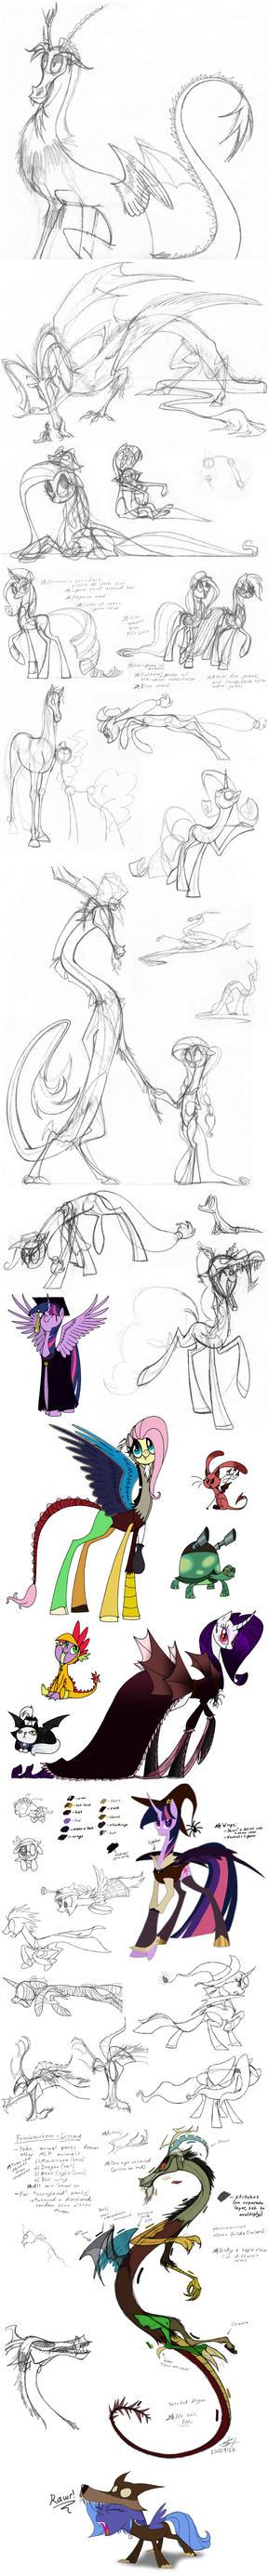 Pony Dump 2014: Costume Edition by grievousfan